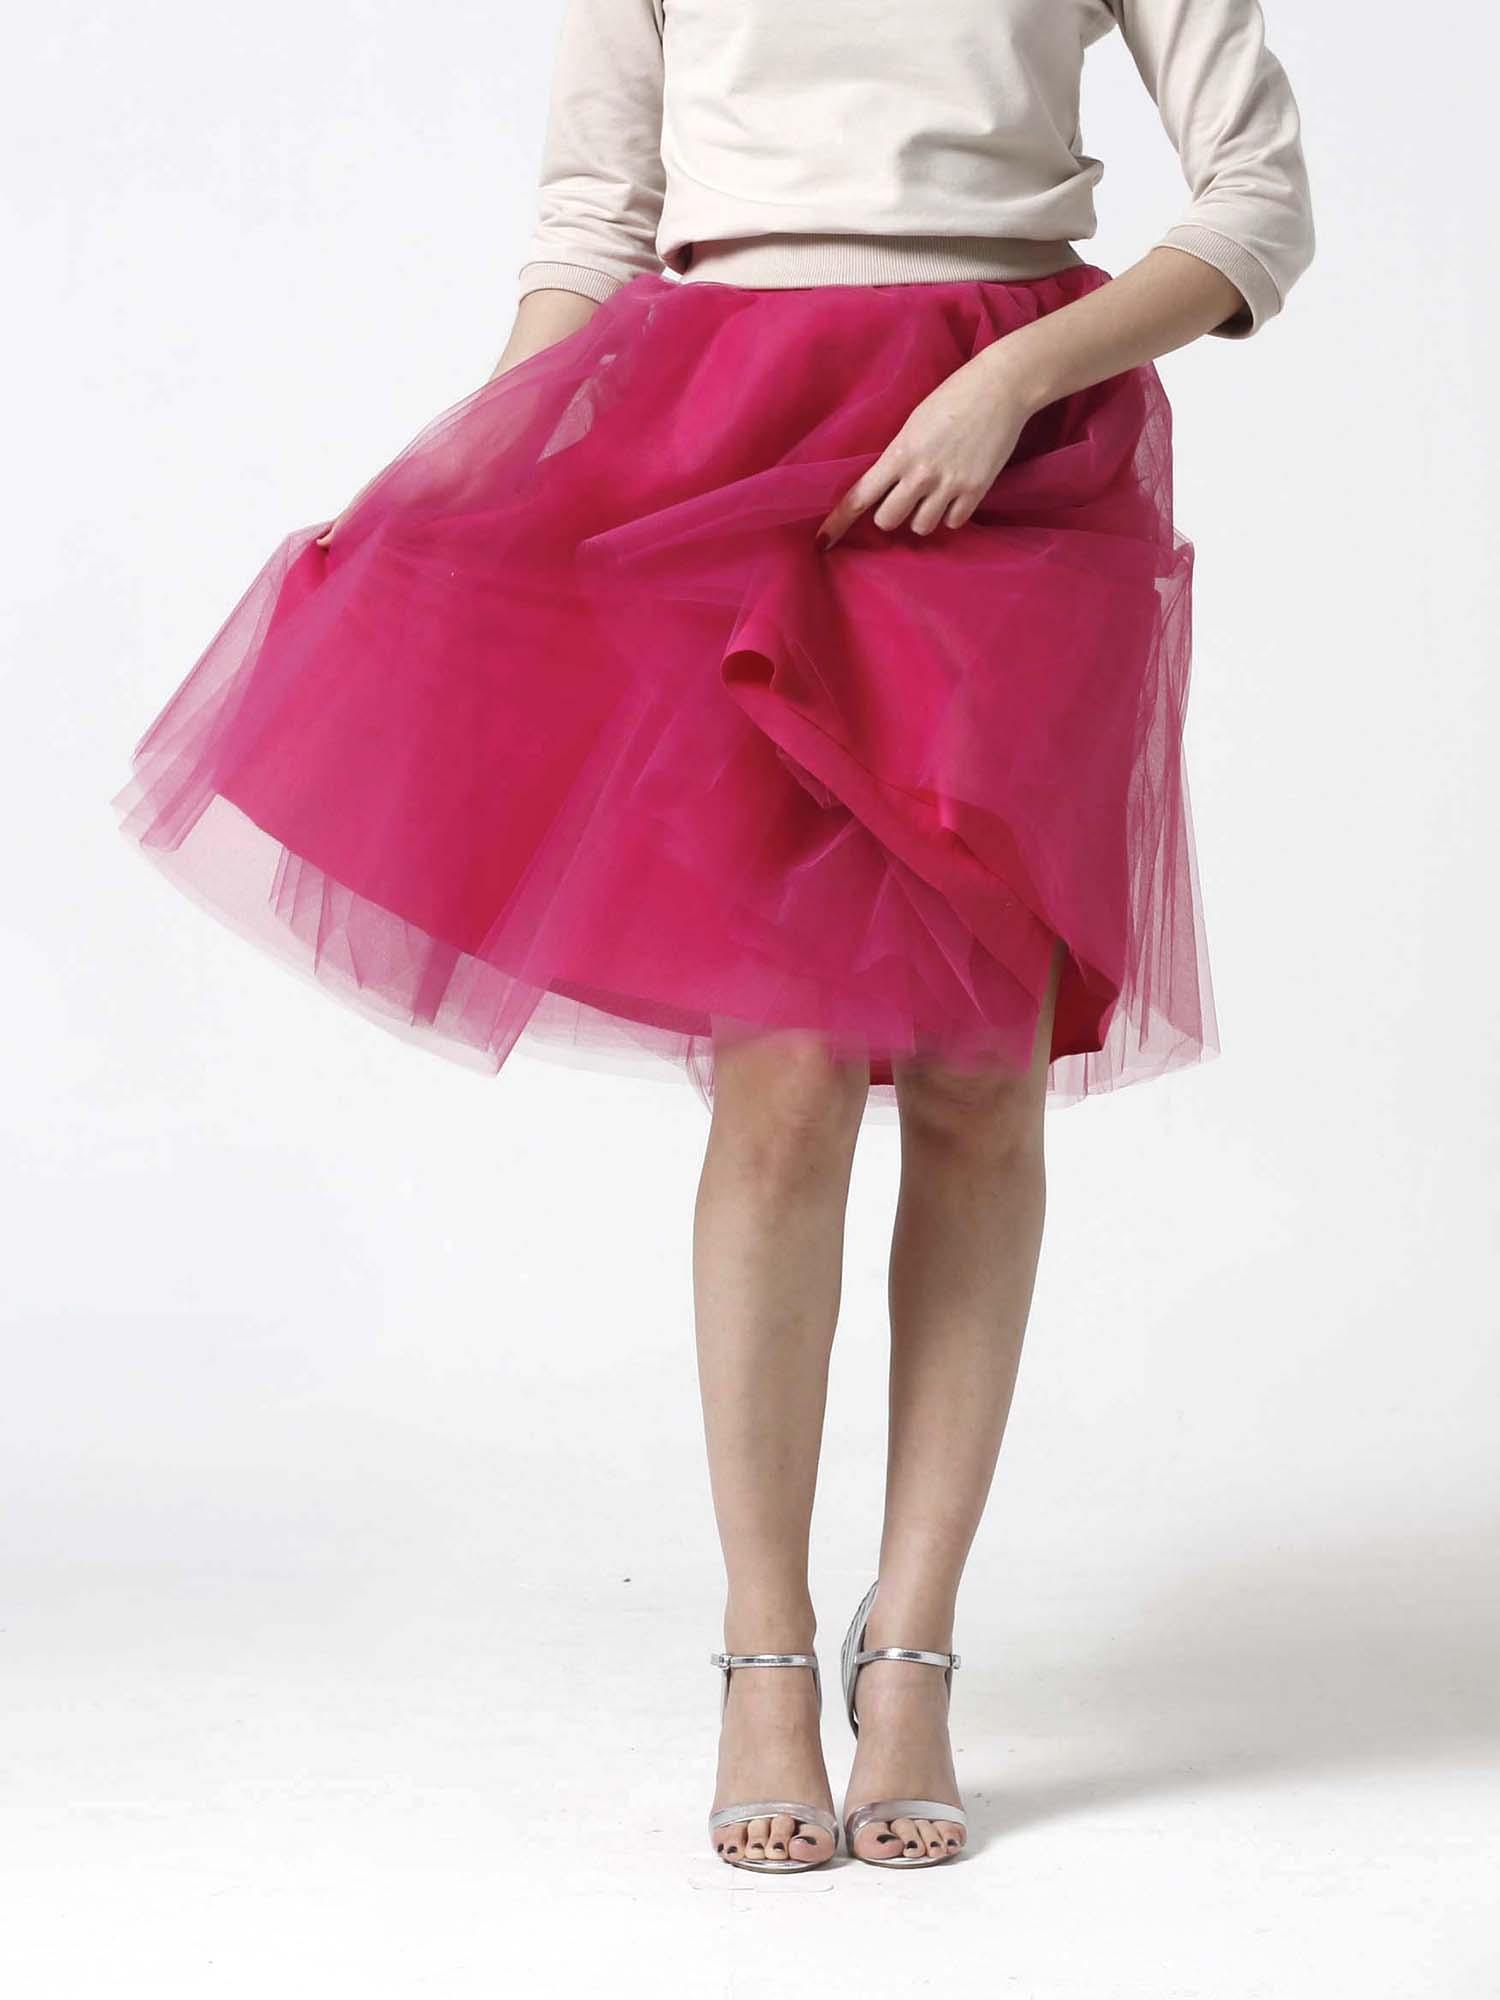 Tylová sukňa Midi sýto ružová - Zuzana Zachar 6ecfaf2841